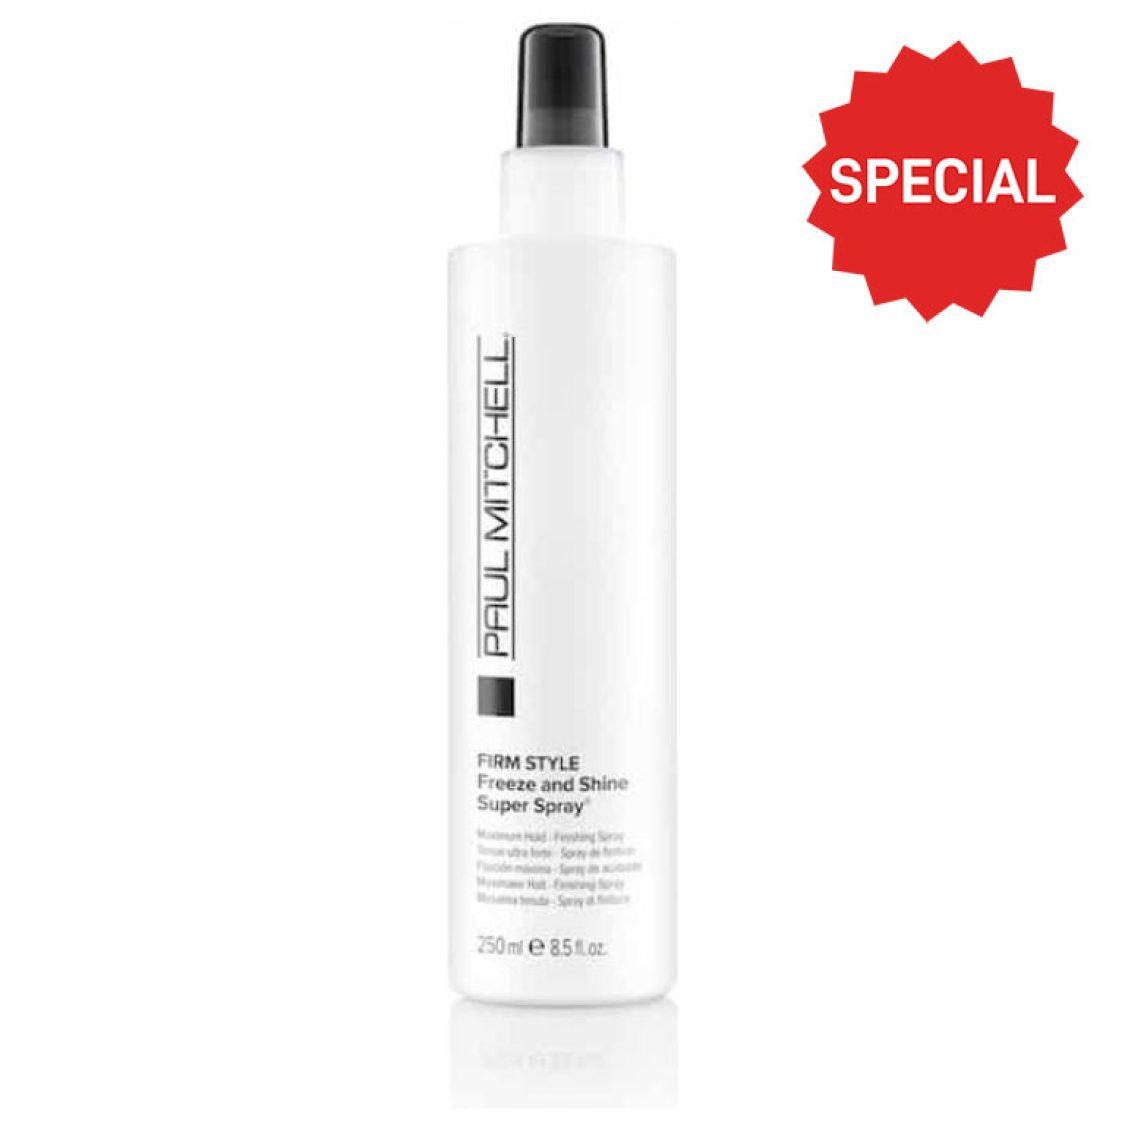 Paul Mitchell - Firm Style - Freeze & Shine Super Spray 250ml